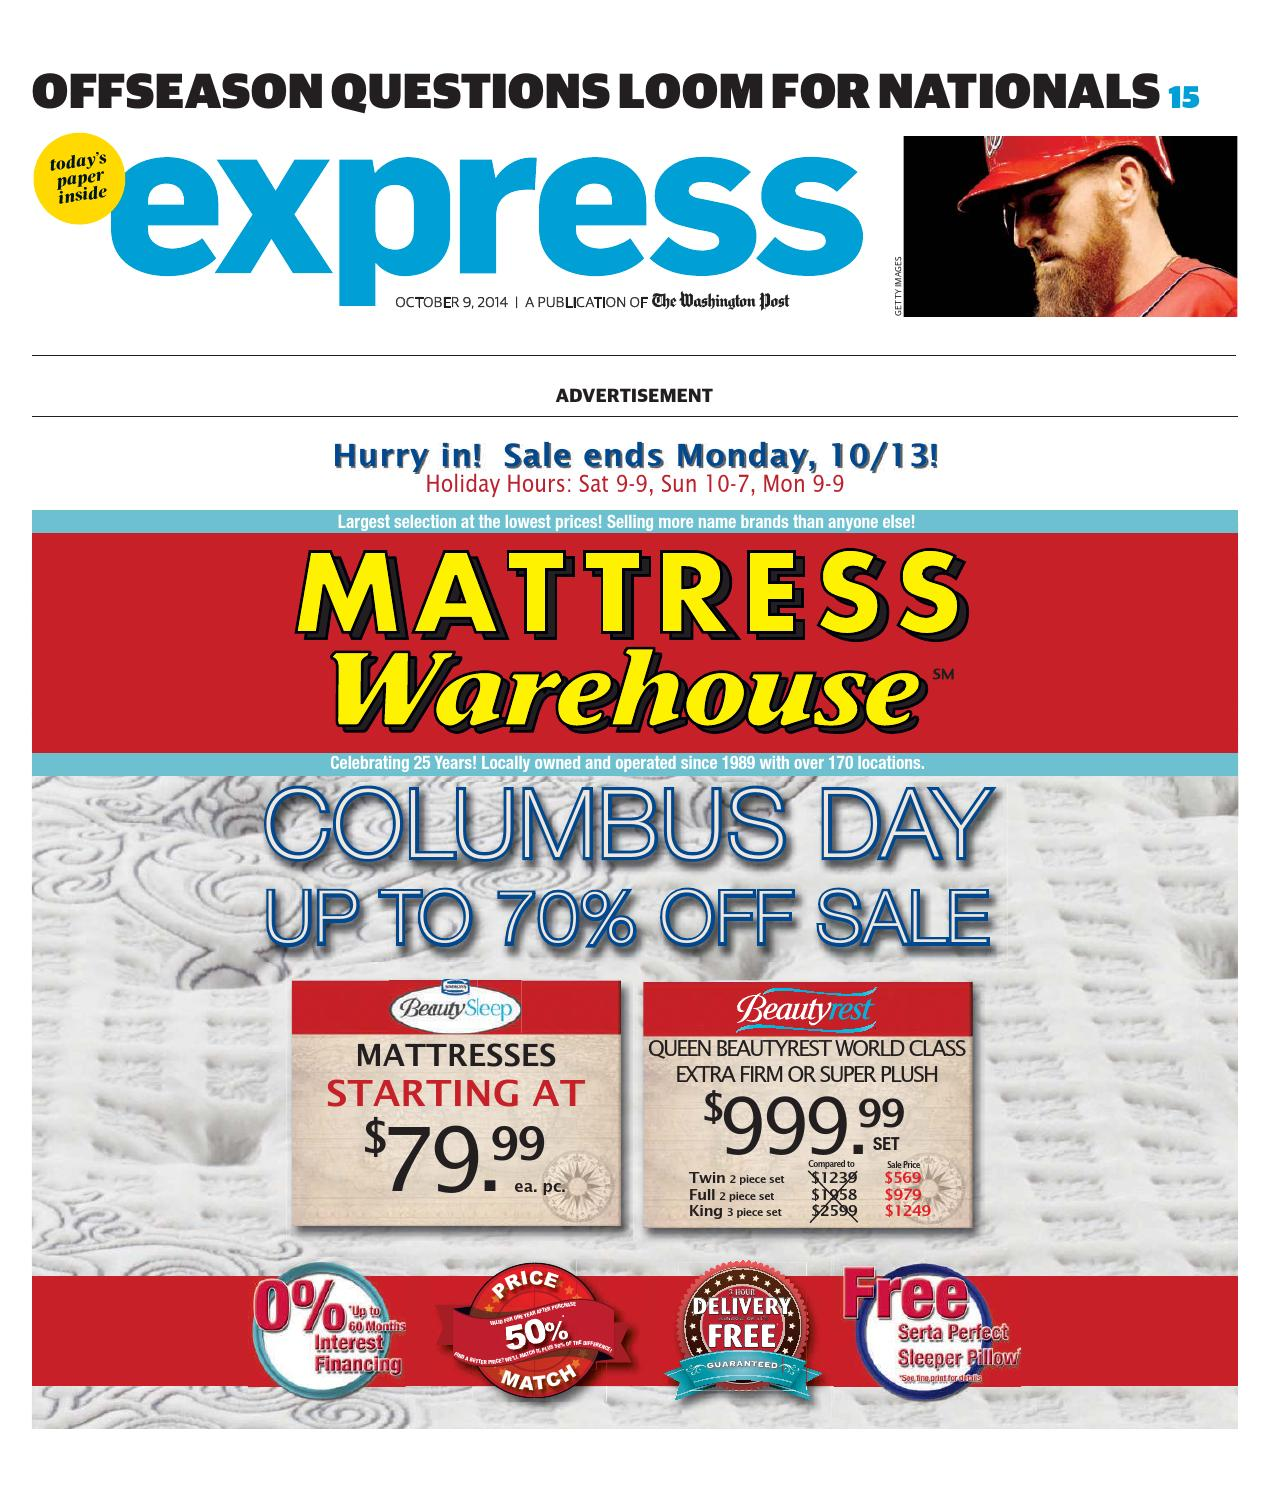 fd9b256b07e EXPRESS 10092014 by Express - issuu